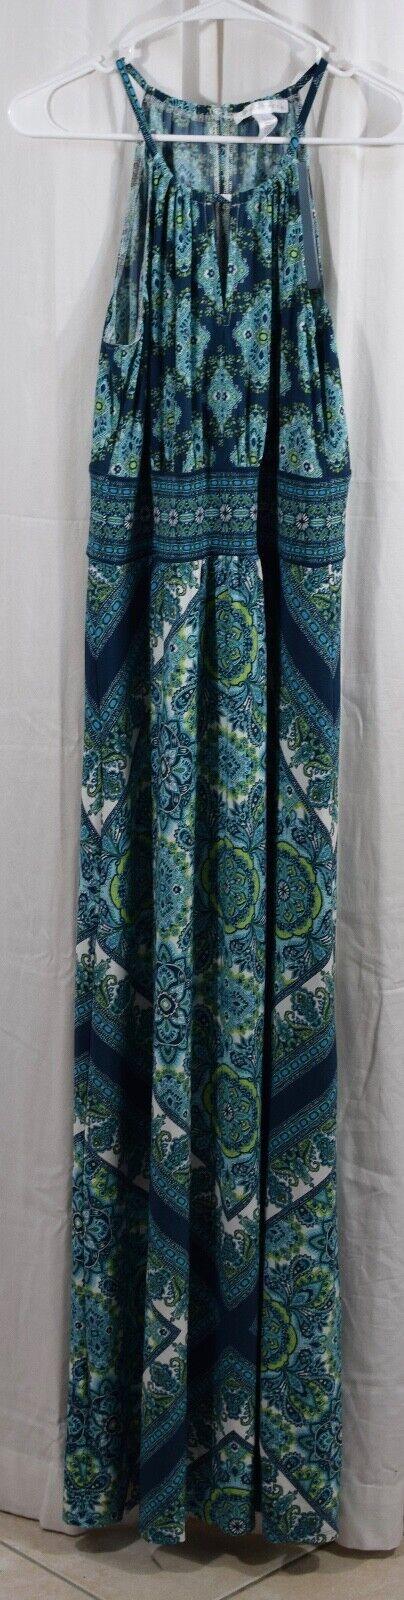 London Times Womens Medallion Print Maxi Dress bluee Size 10